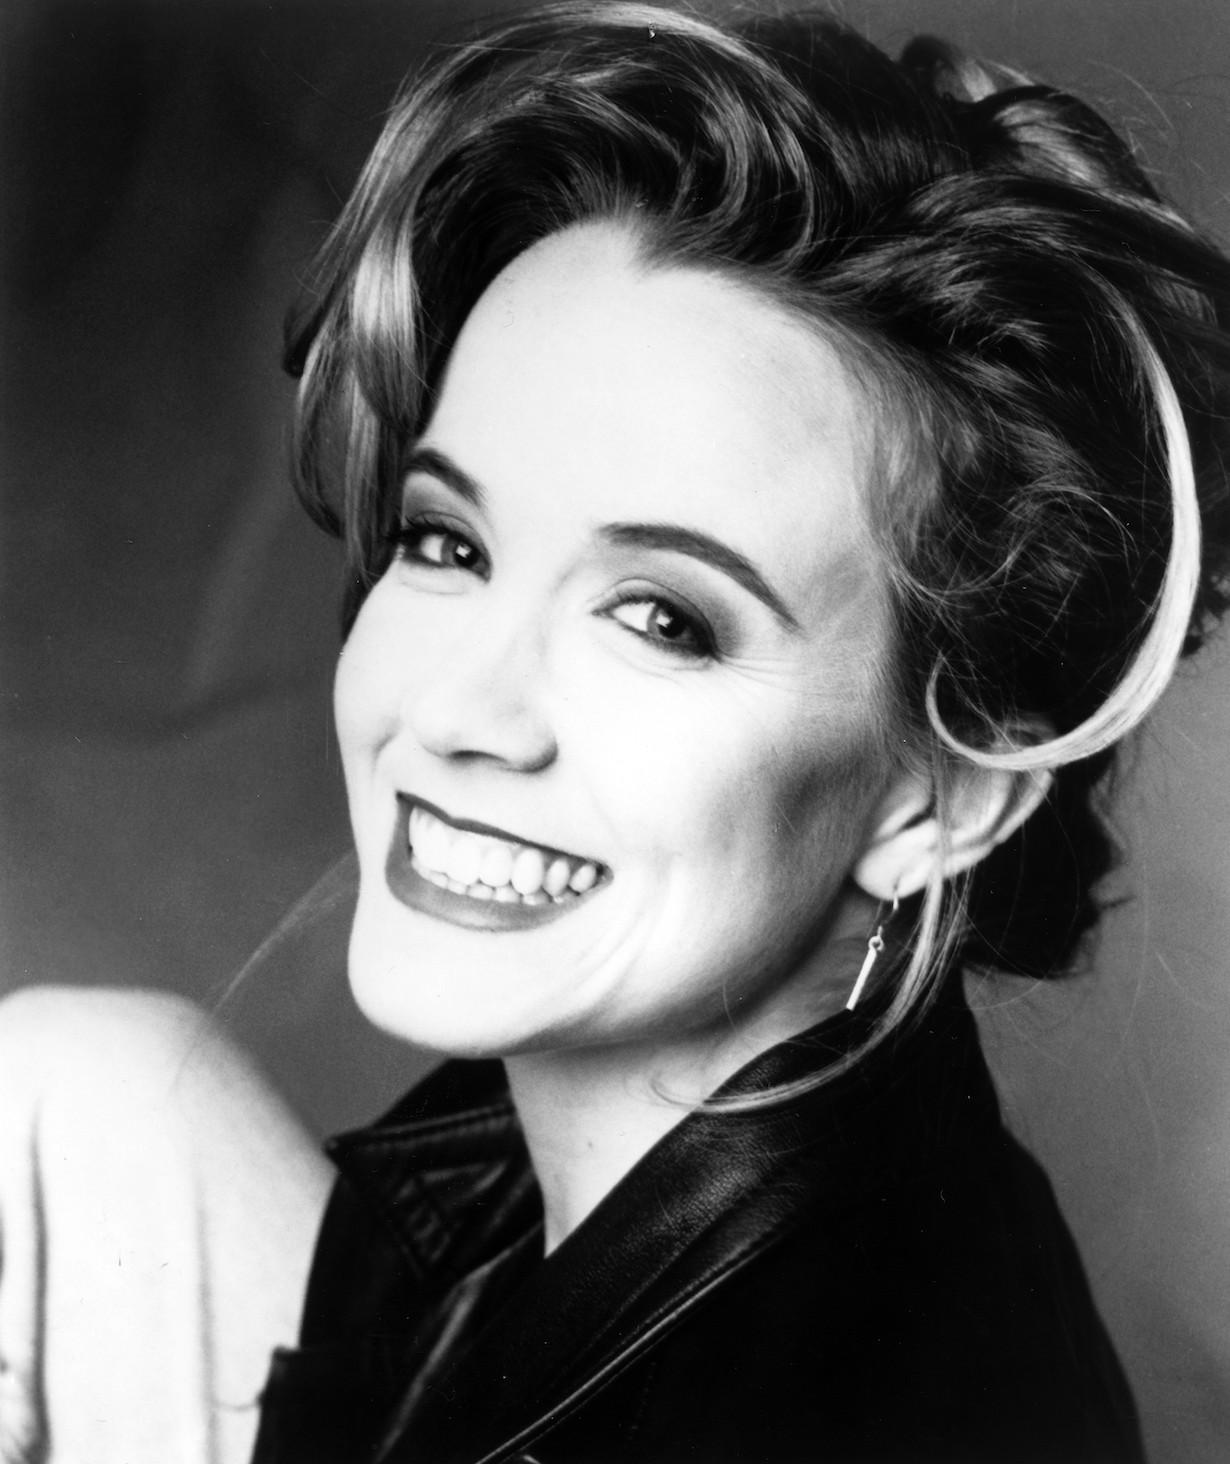 THE CITY, Melissa Dye, 1995-1997. /© ABC / Courtesy Everett Collection